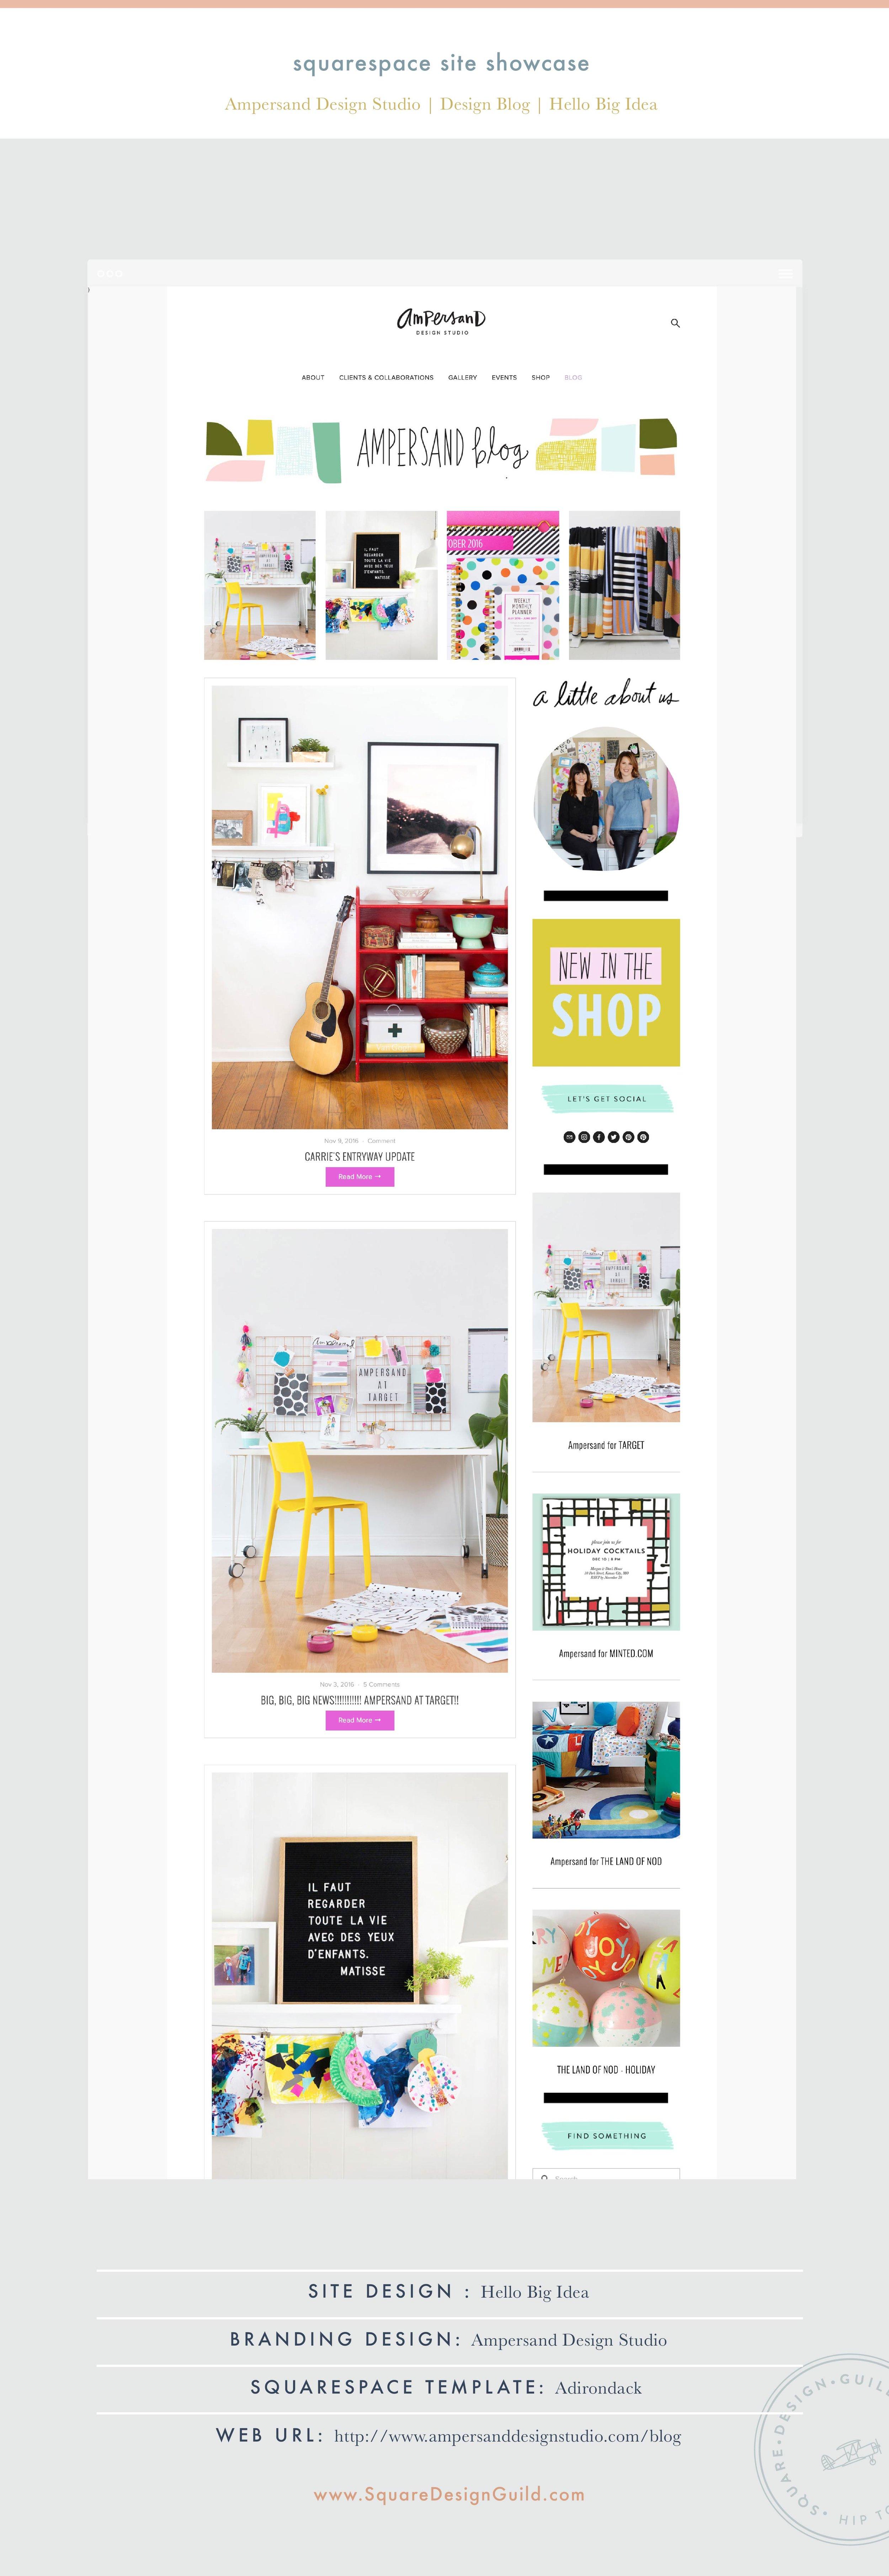 Site Showcase: Ampersand Design Studio Blog by Hello Big Idea on the Adirondack Template